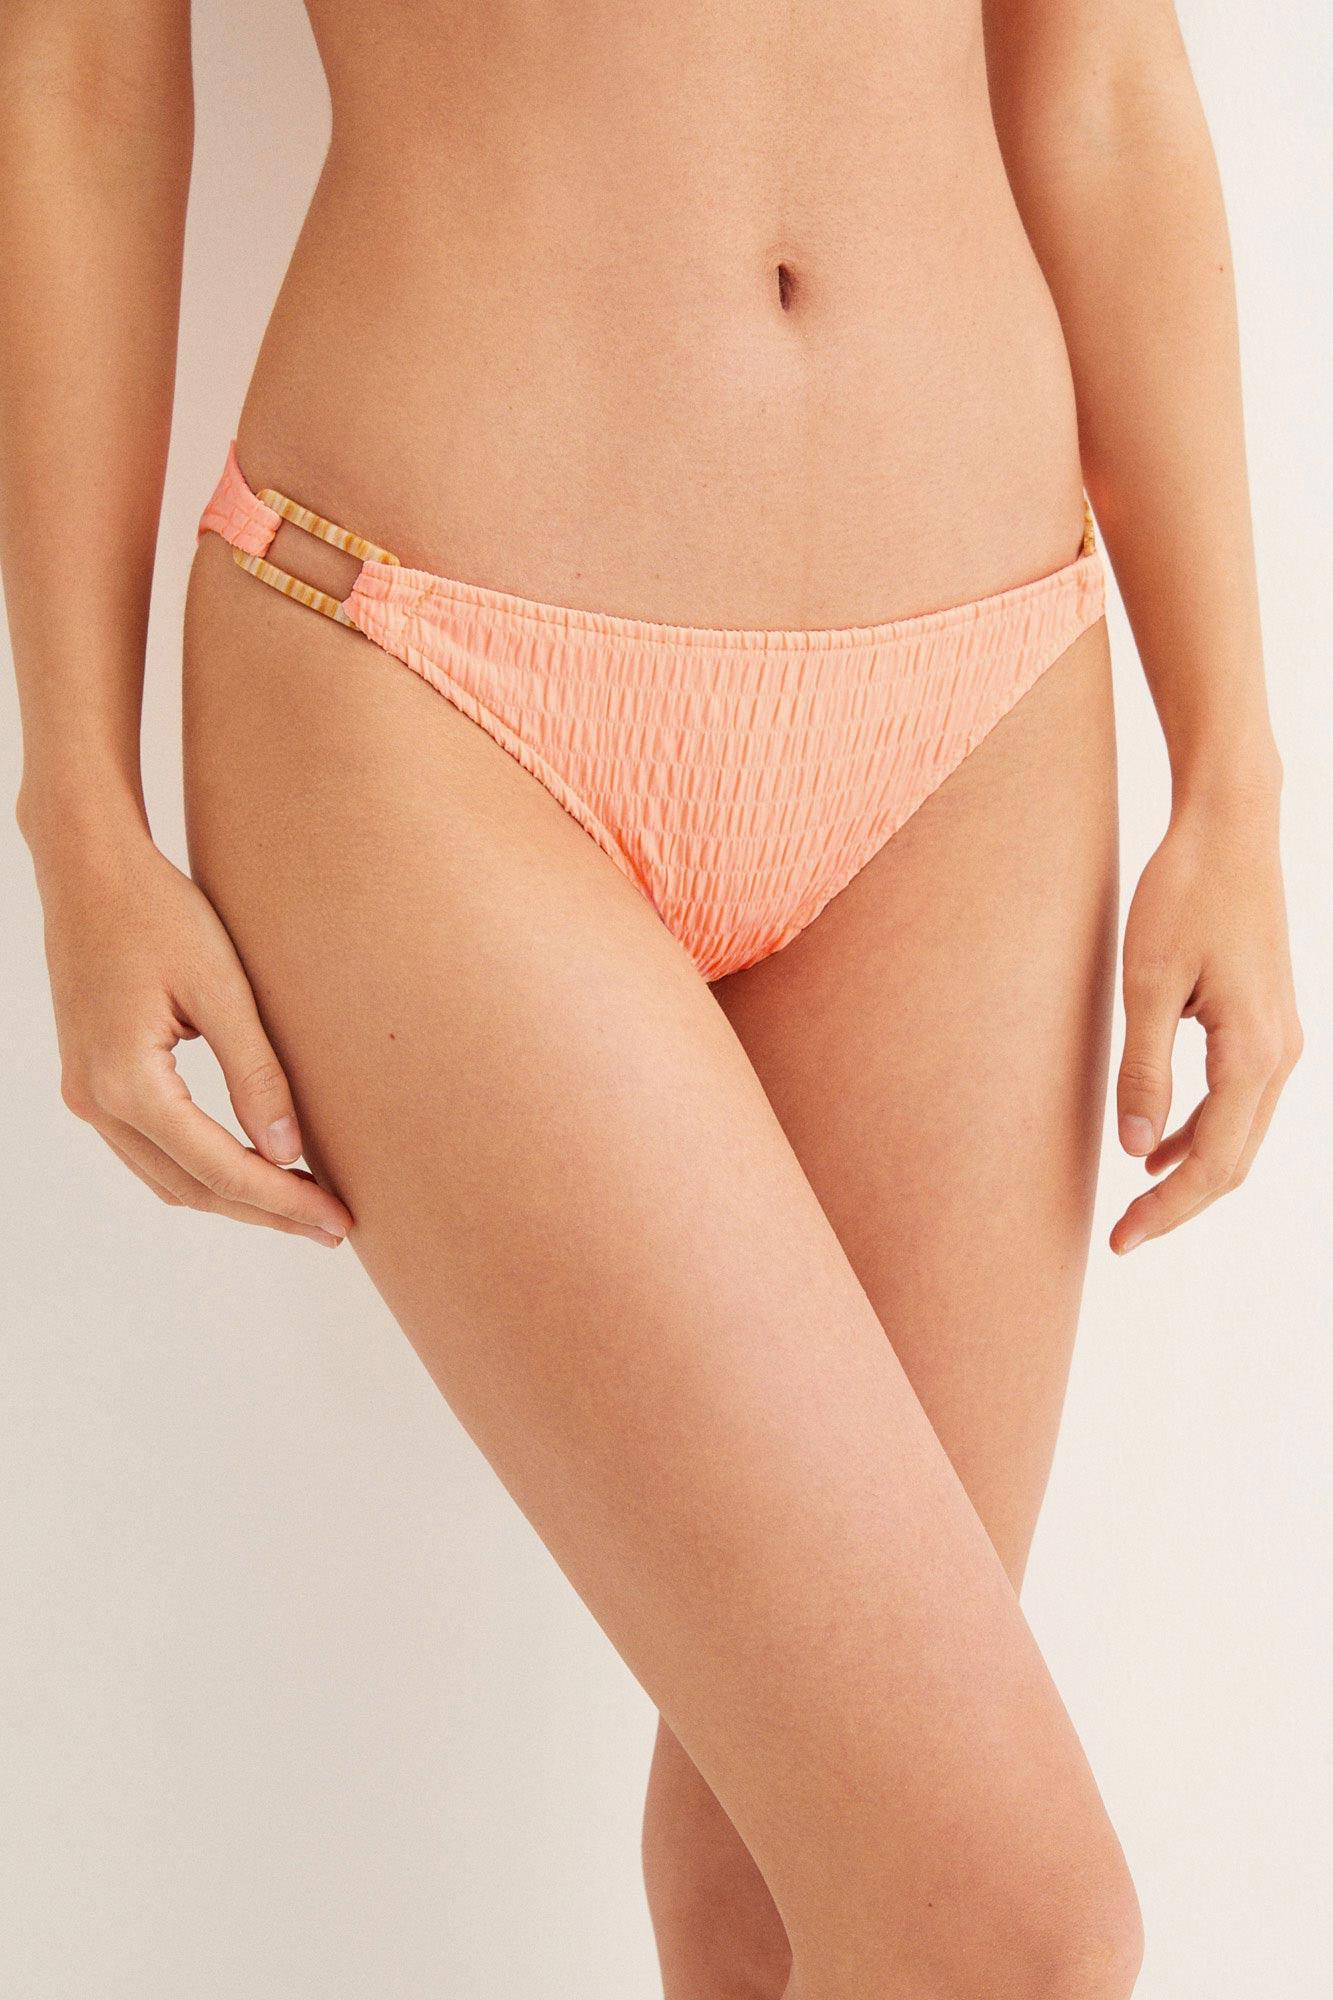 Braga bikini anillas